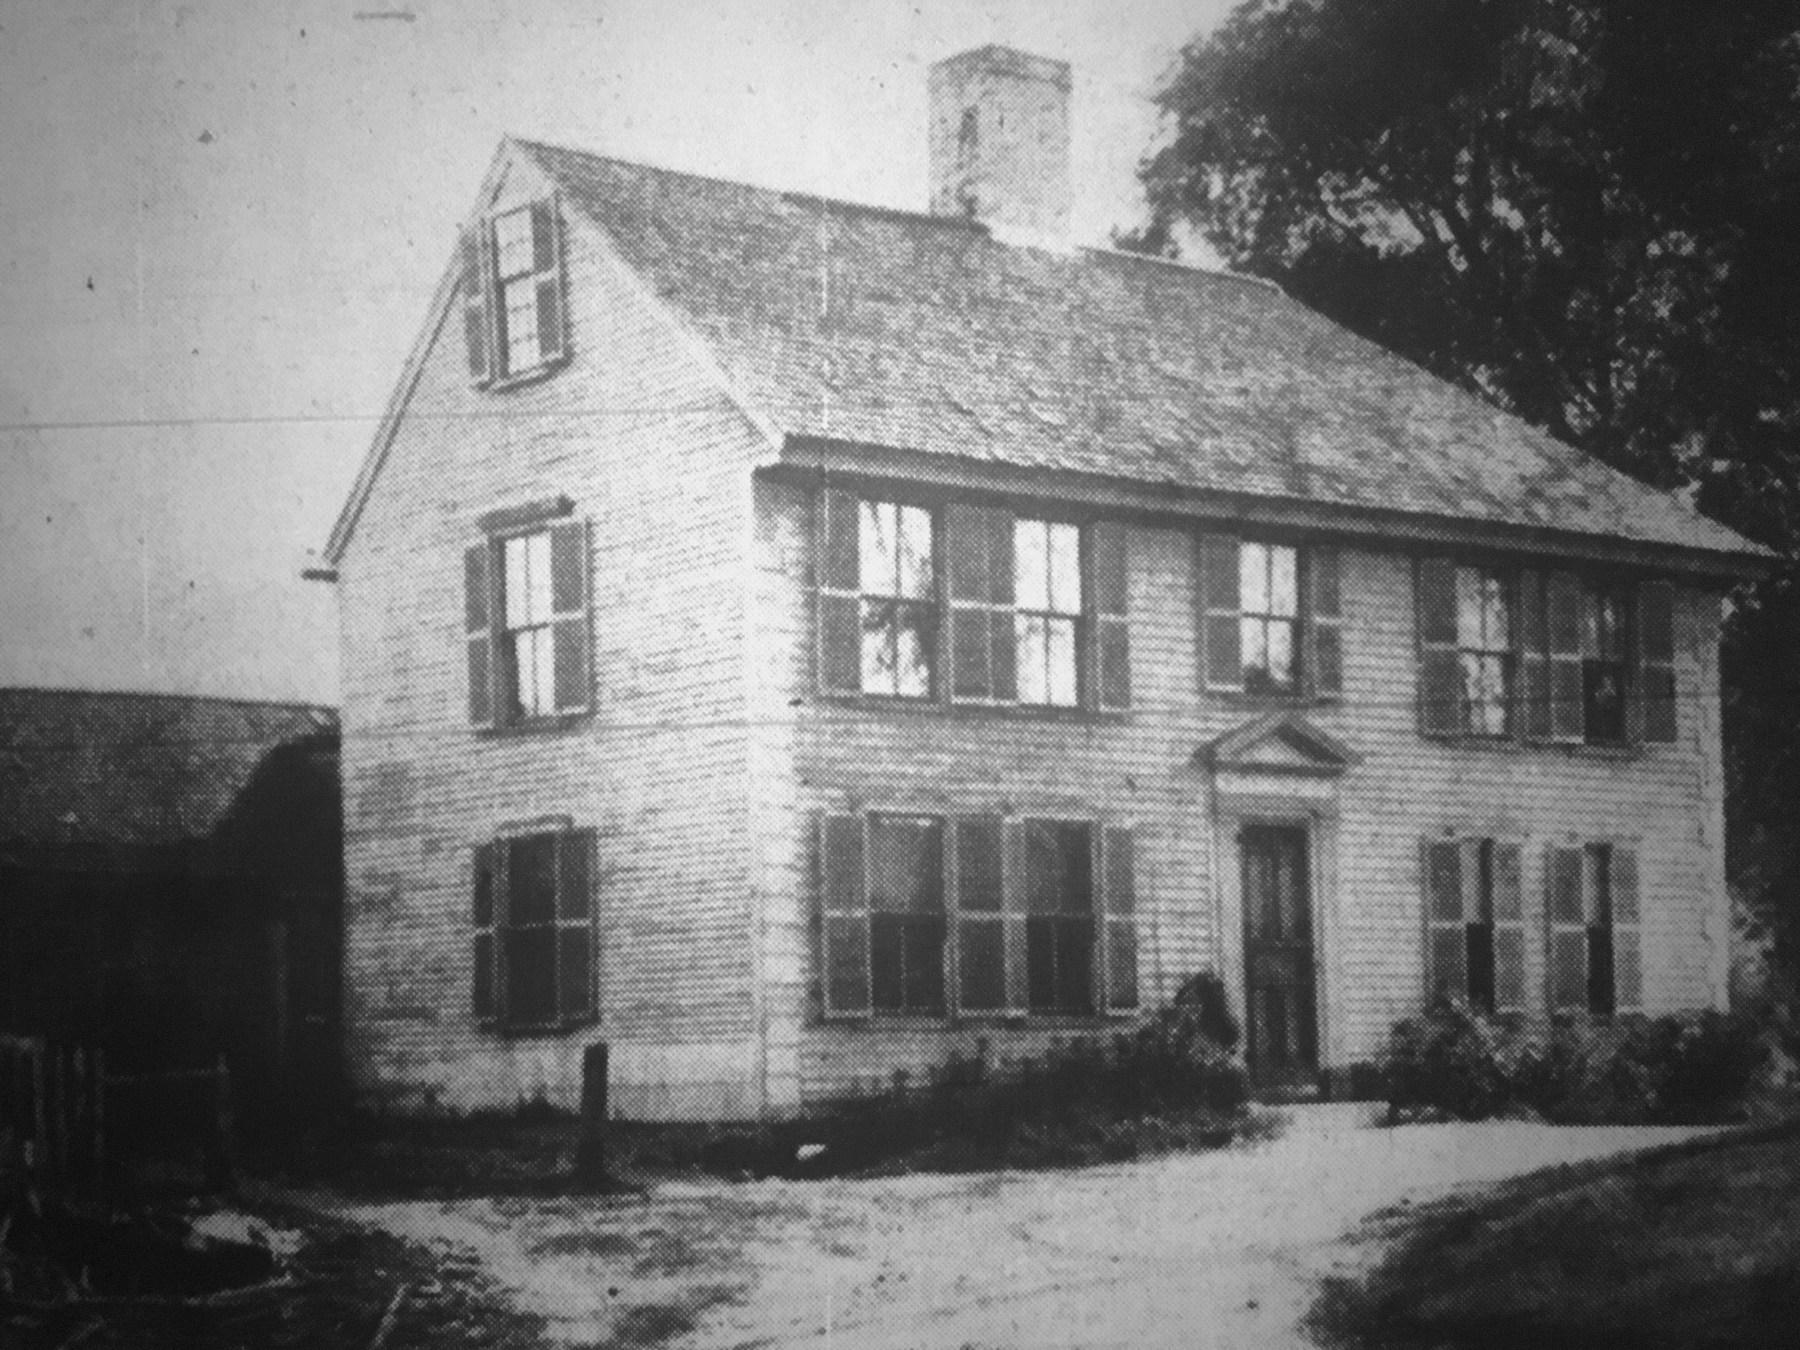 Sewall House